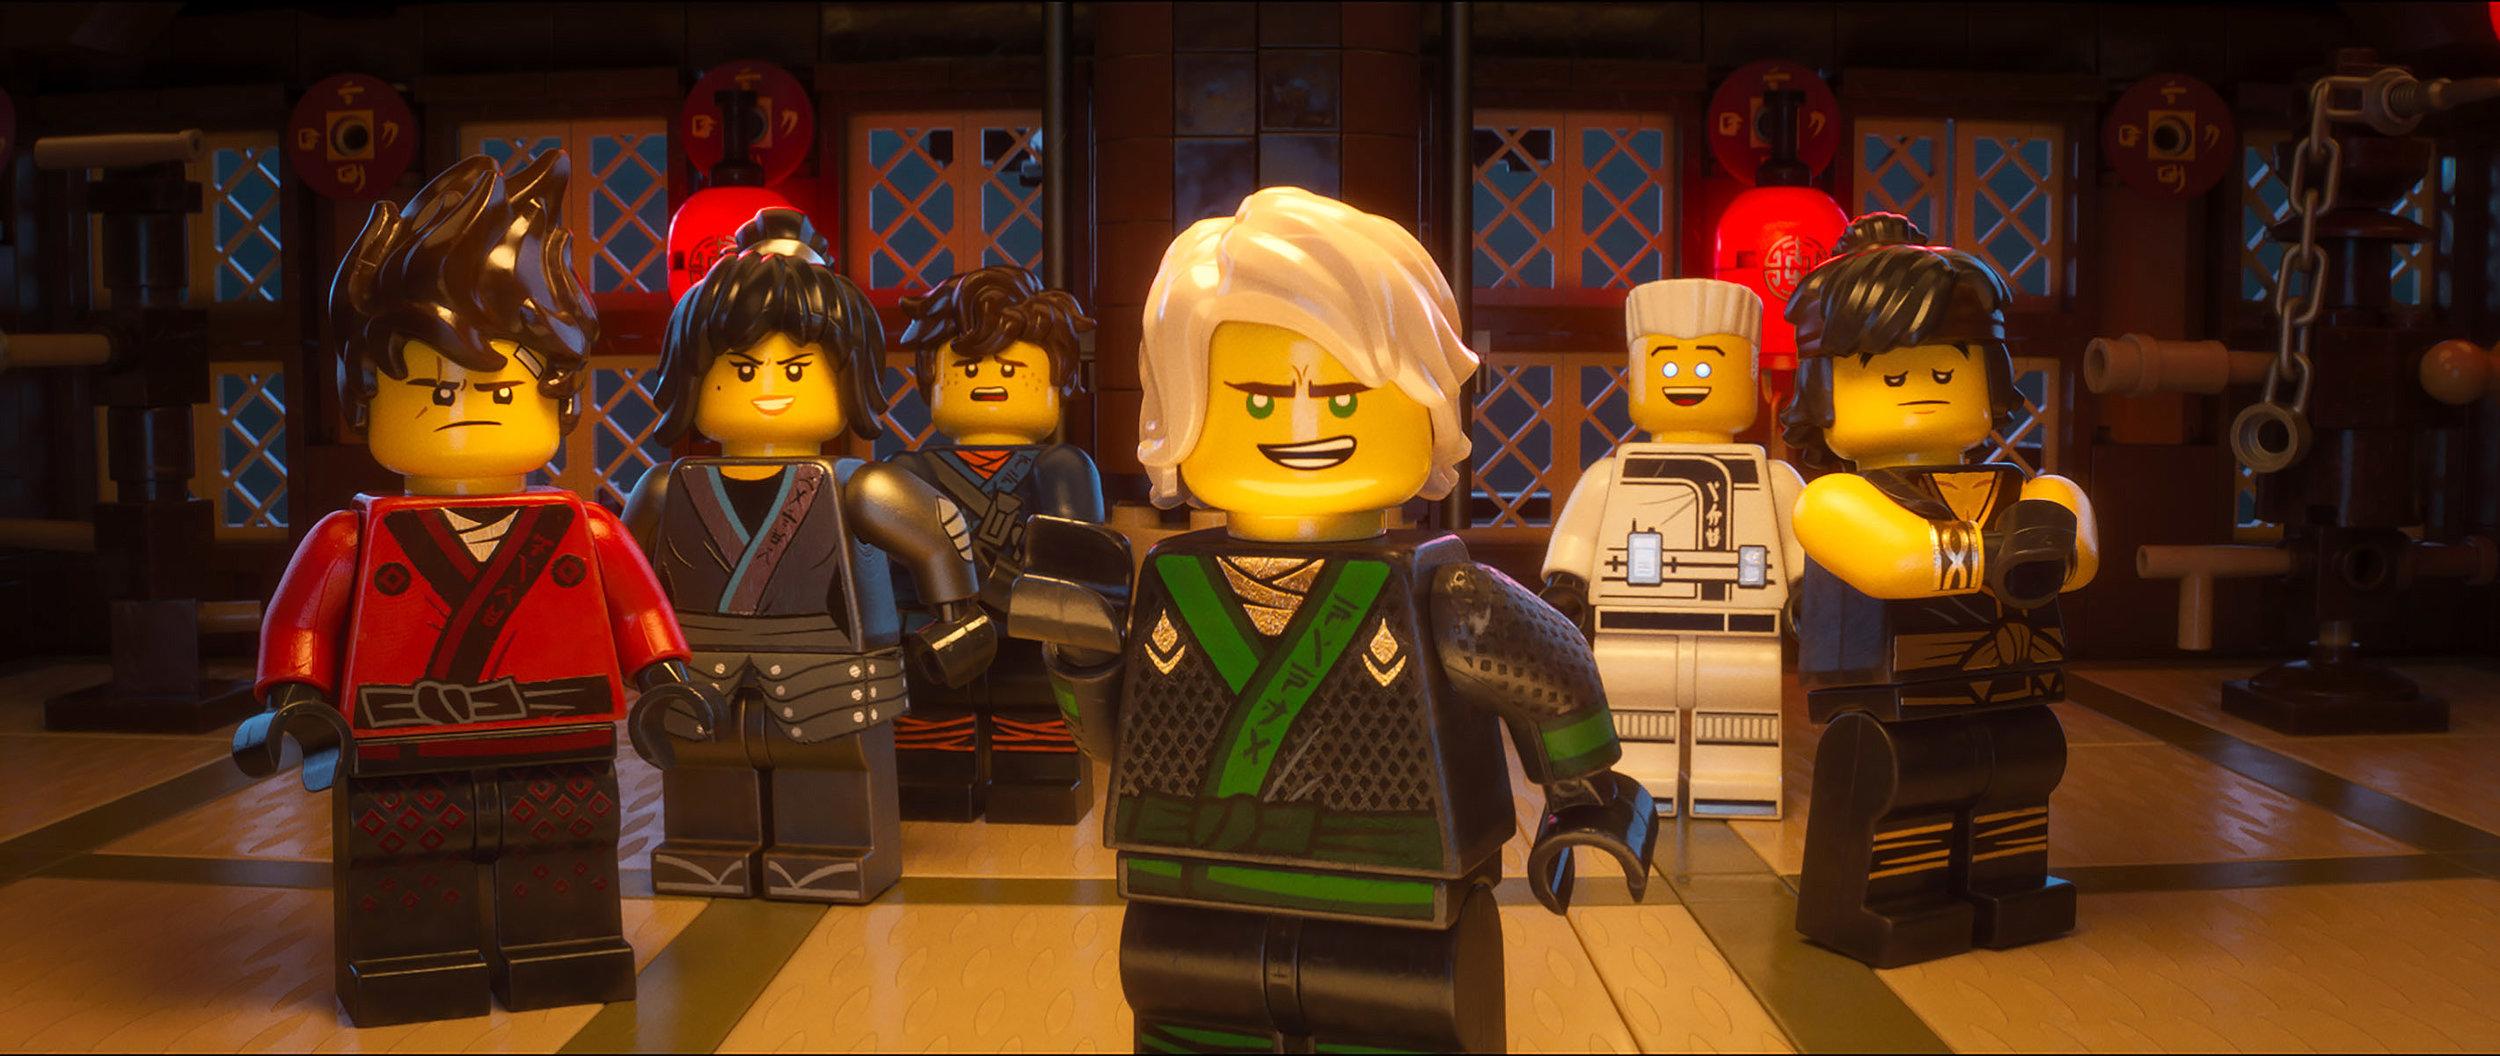 the-lego-ninjago-movie-image-2.jpg